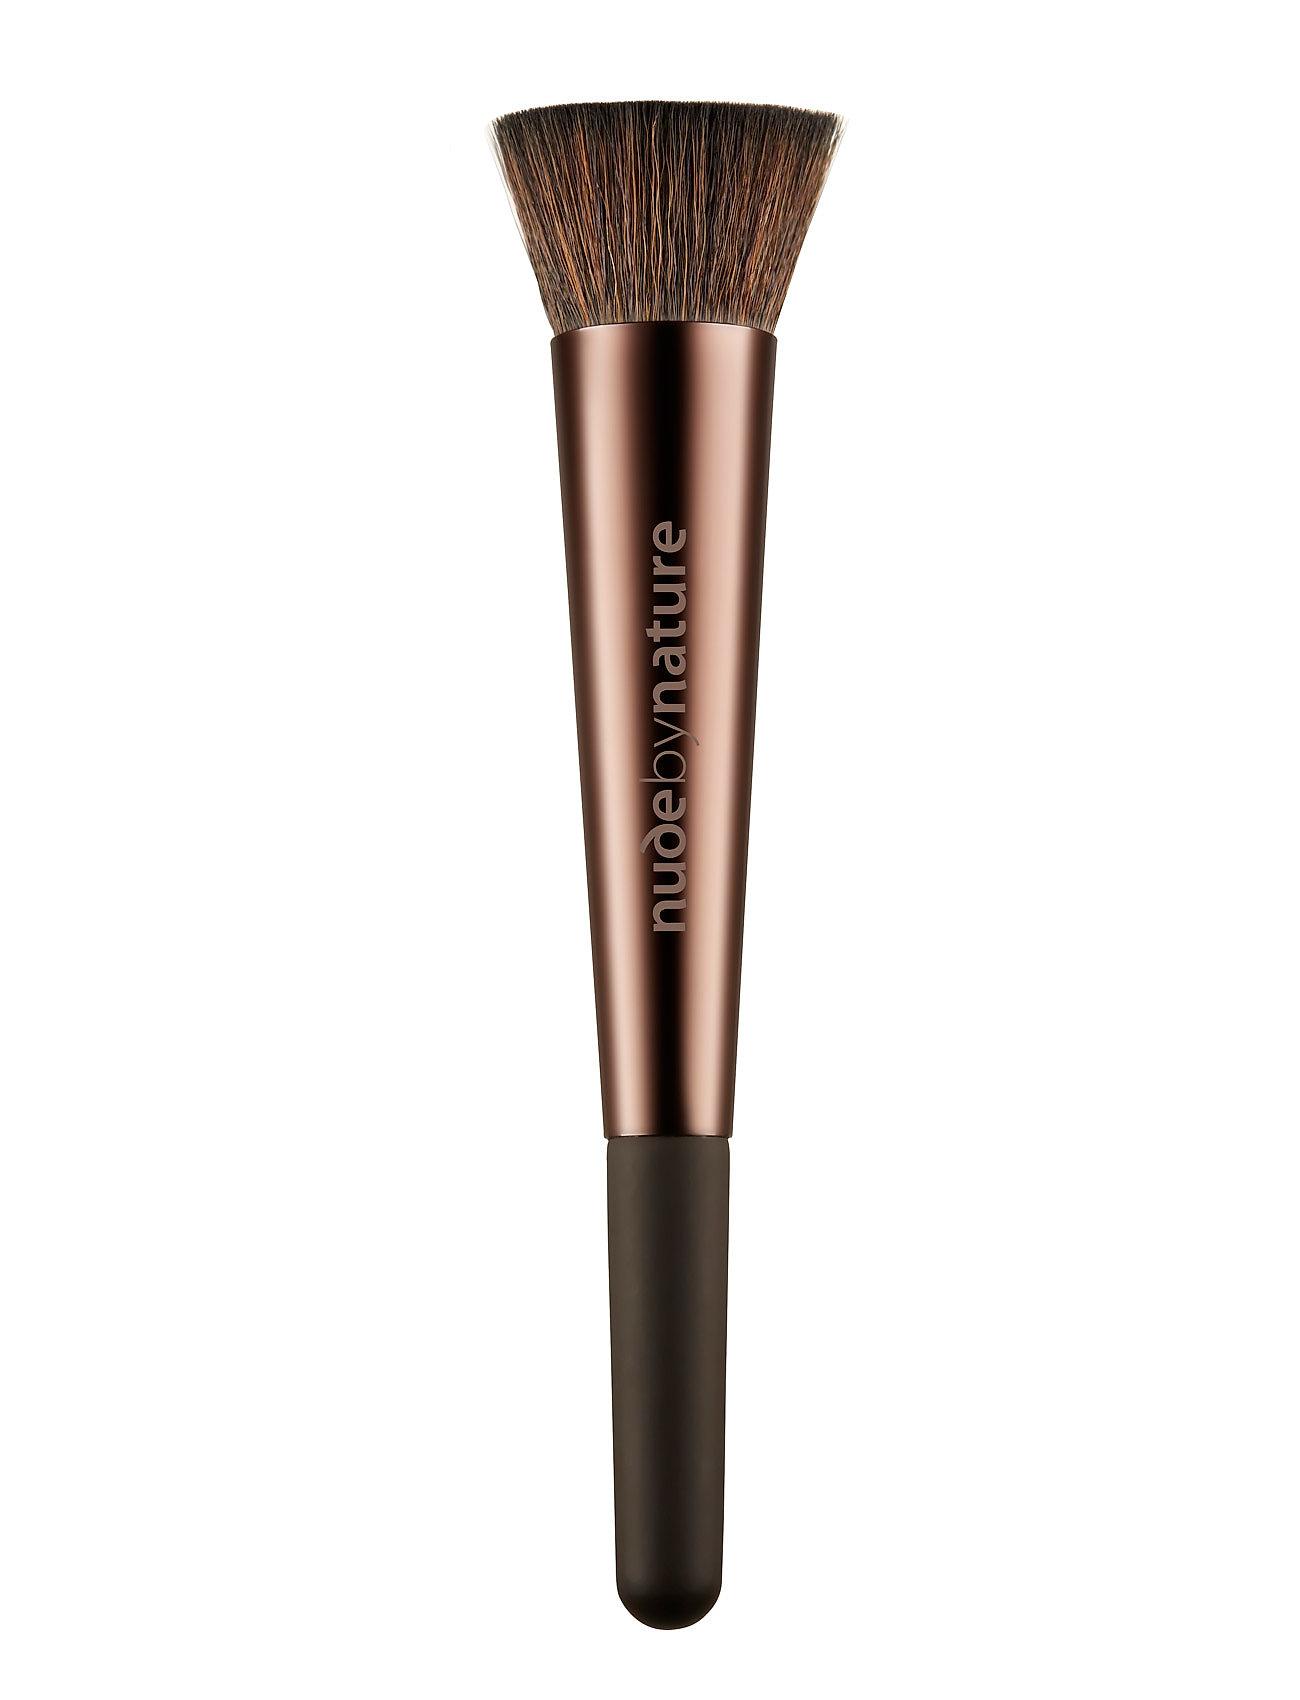 Image of Brushes 08 Buffing Brush Ansigtsbørste Makeup Nude Nude By Nature (2844048221)